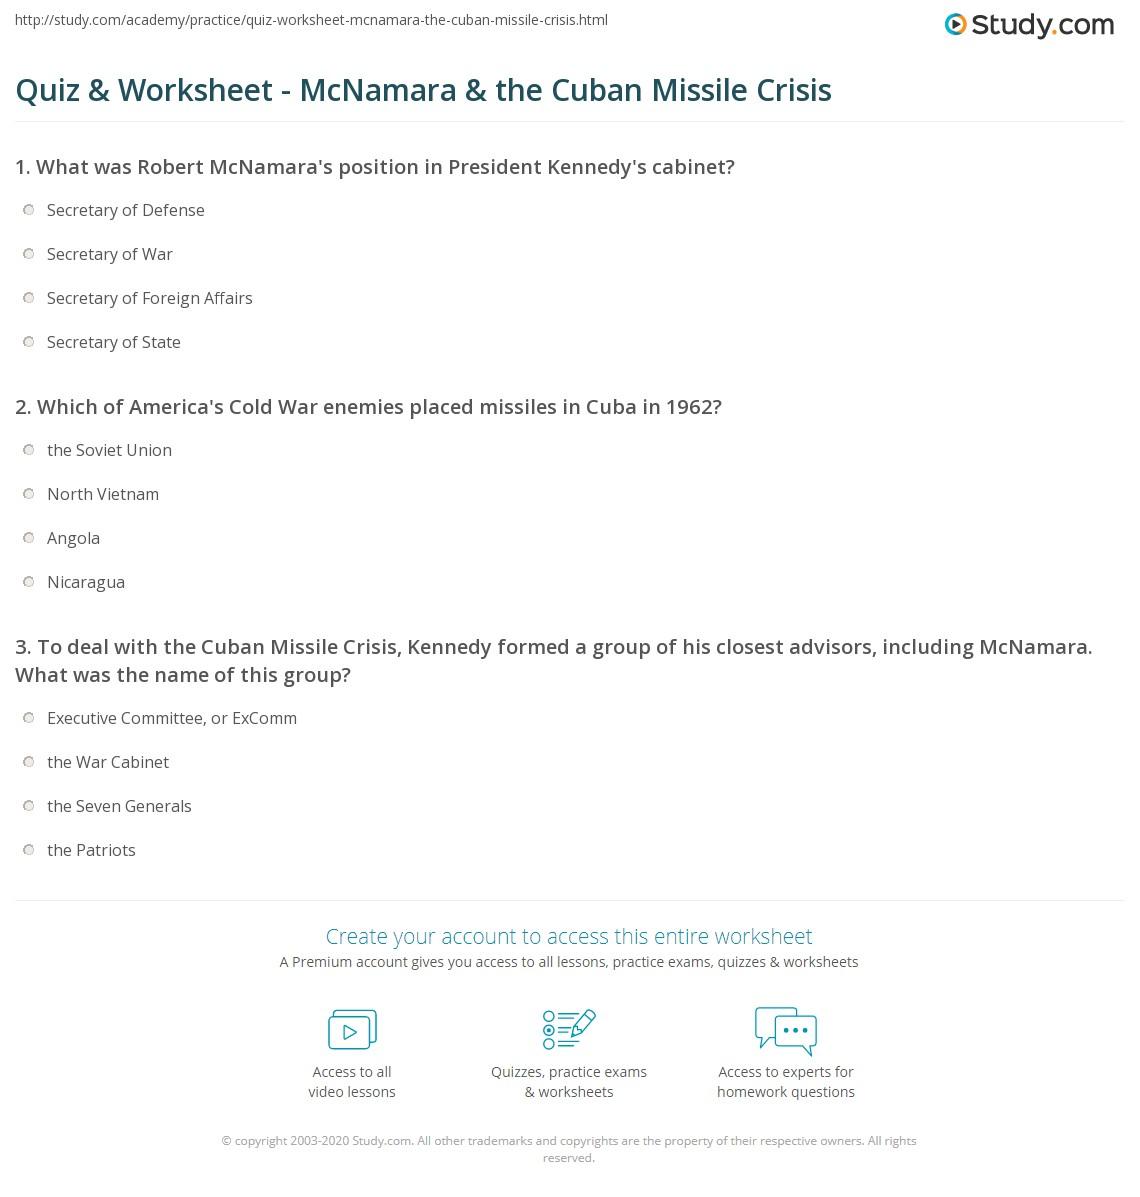 quiz worksheet mcnamara the cuban missile crisis. Black Bedroom Furniture Sets. Home Design Ideas